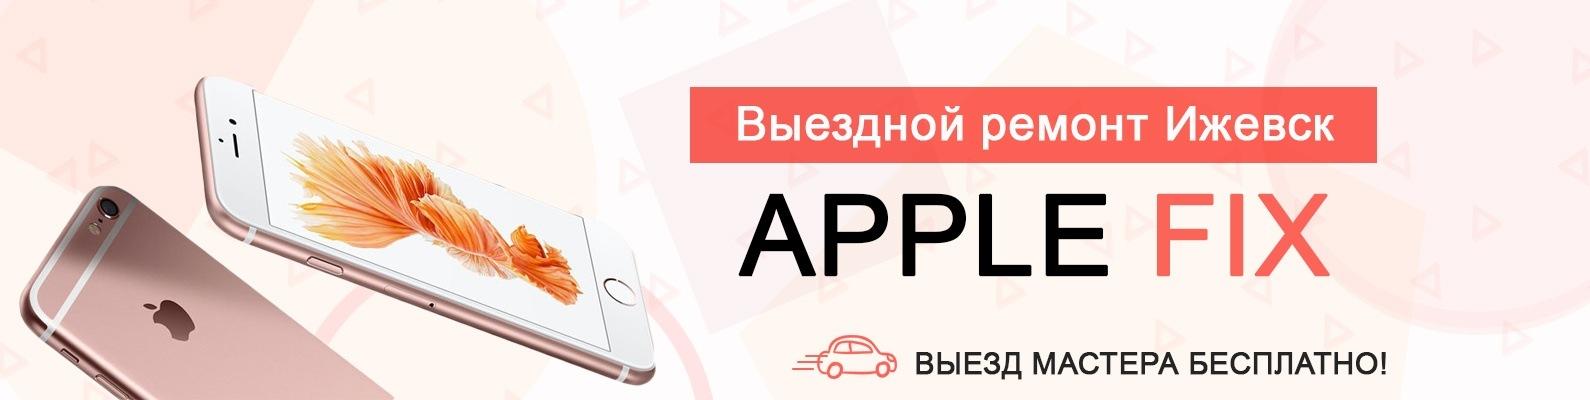 ремонт apple ижевск